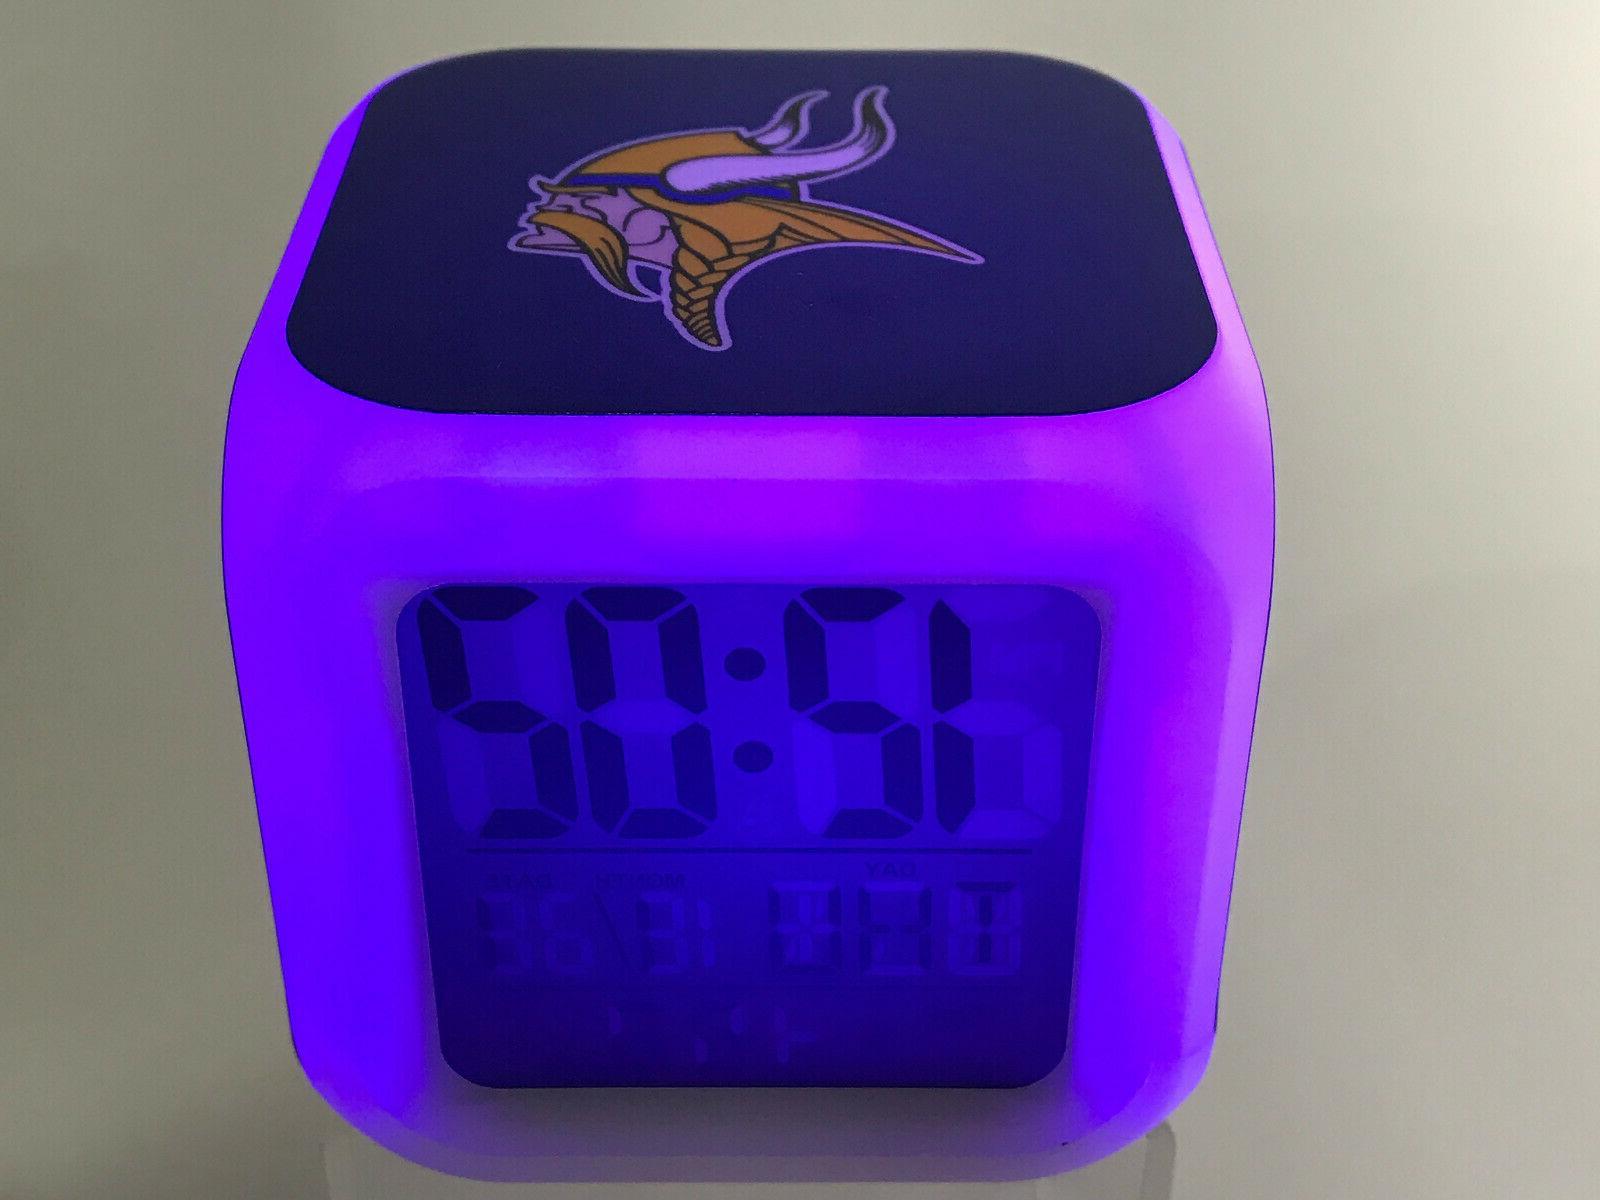 minnesota vikings led digital alarm clock watch